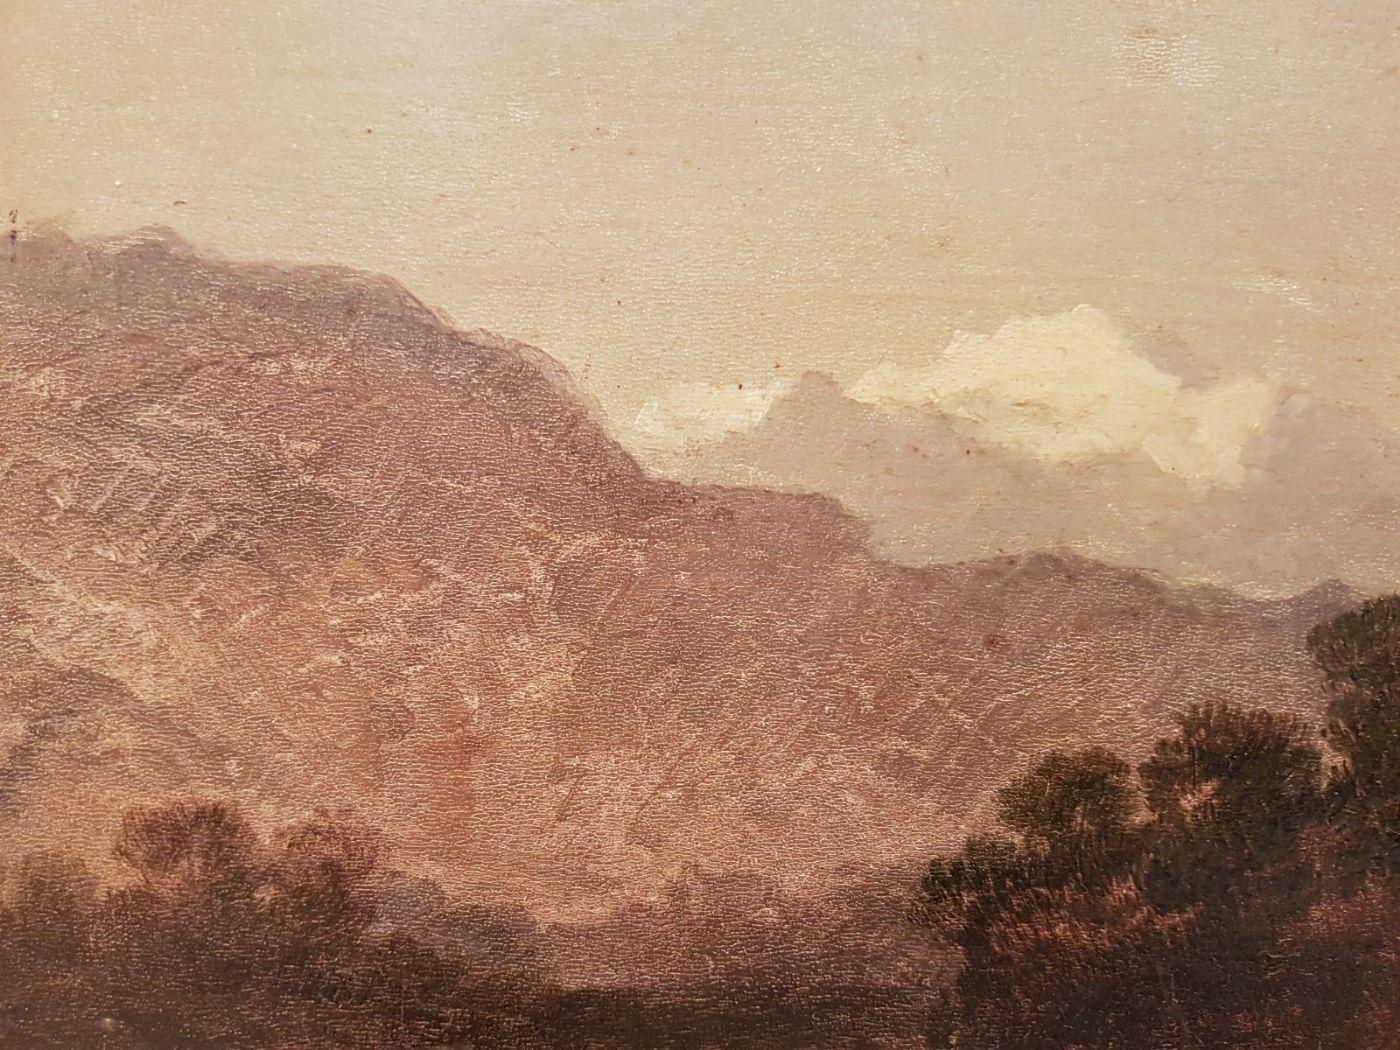 thumb2|Paesaggio montano.